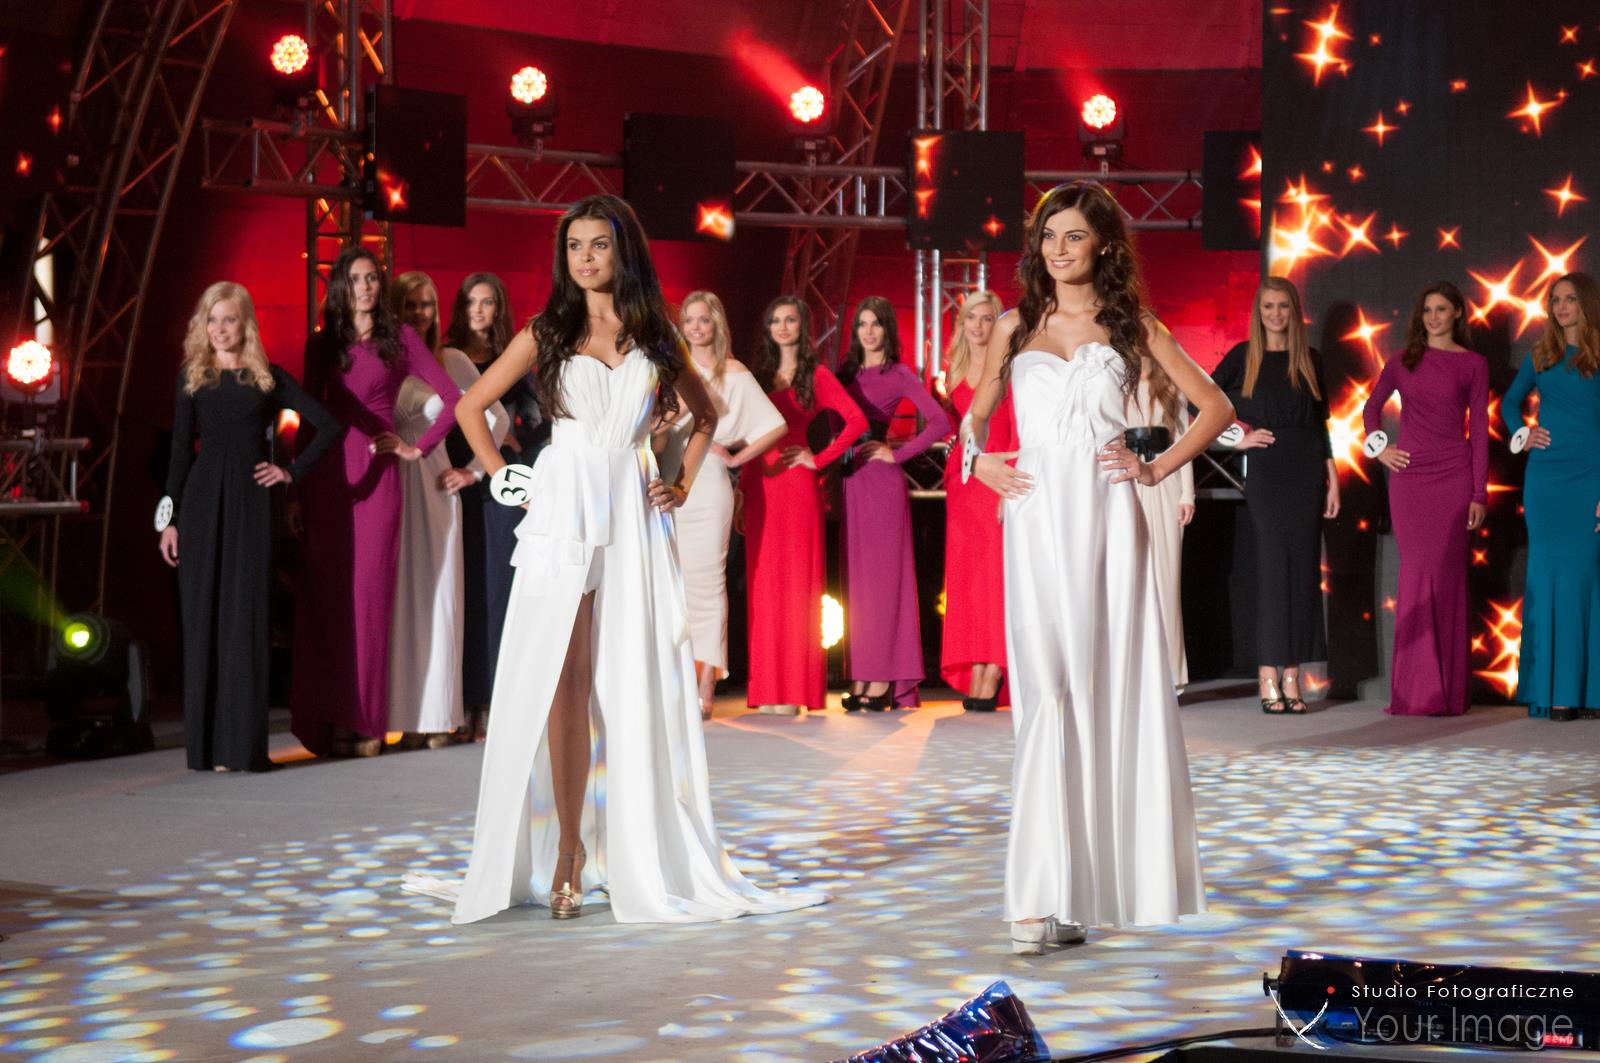 Miss Polski 2013, Kolekcja Nikonorov